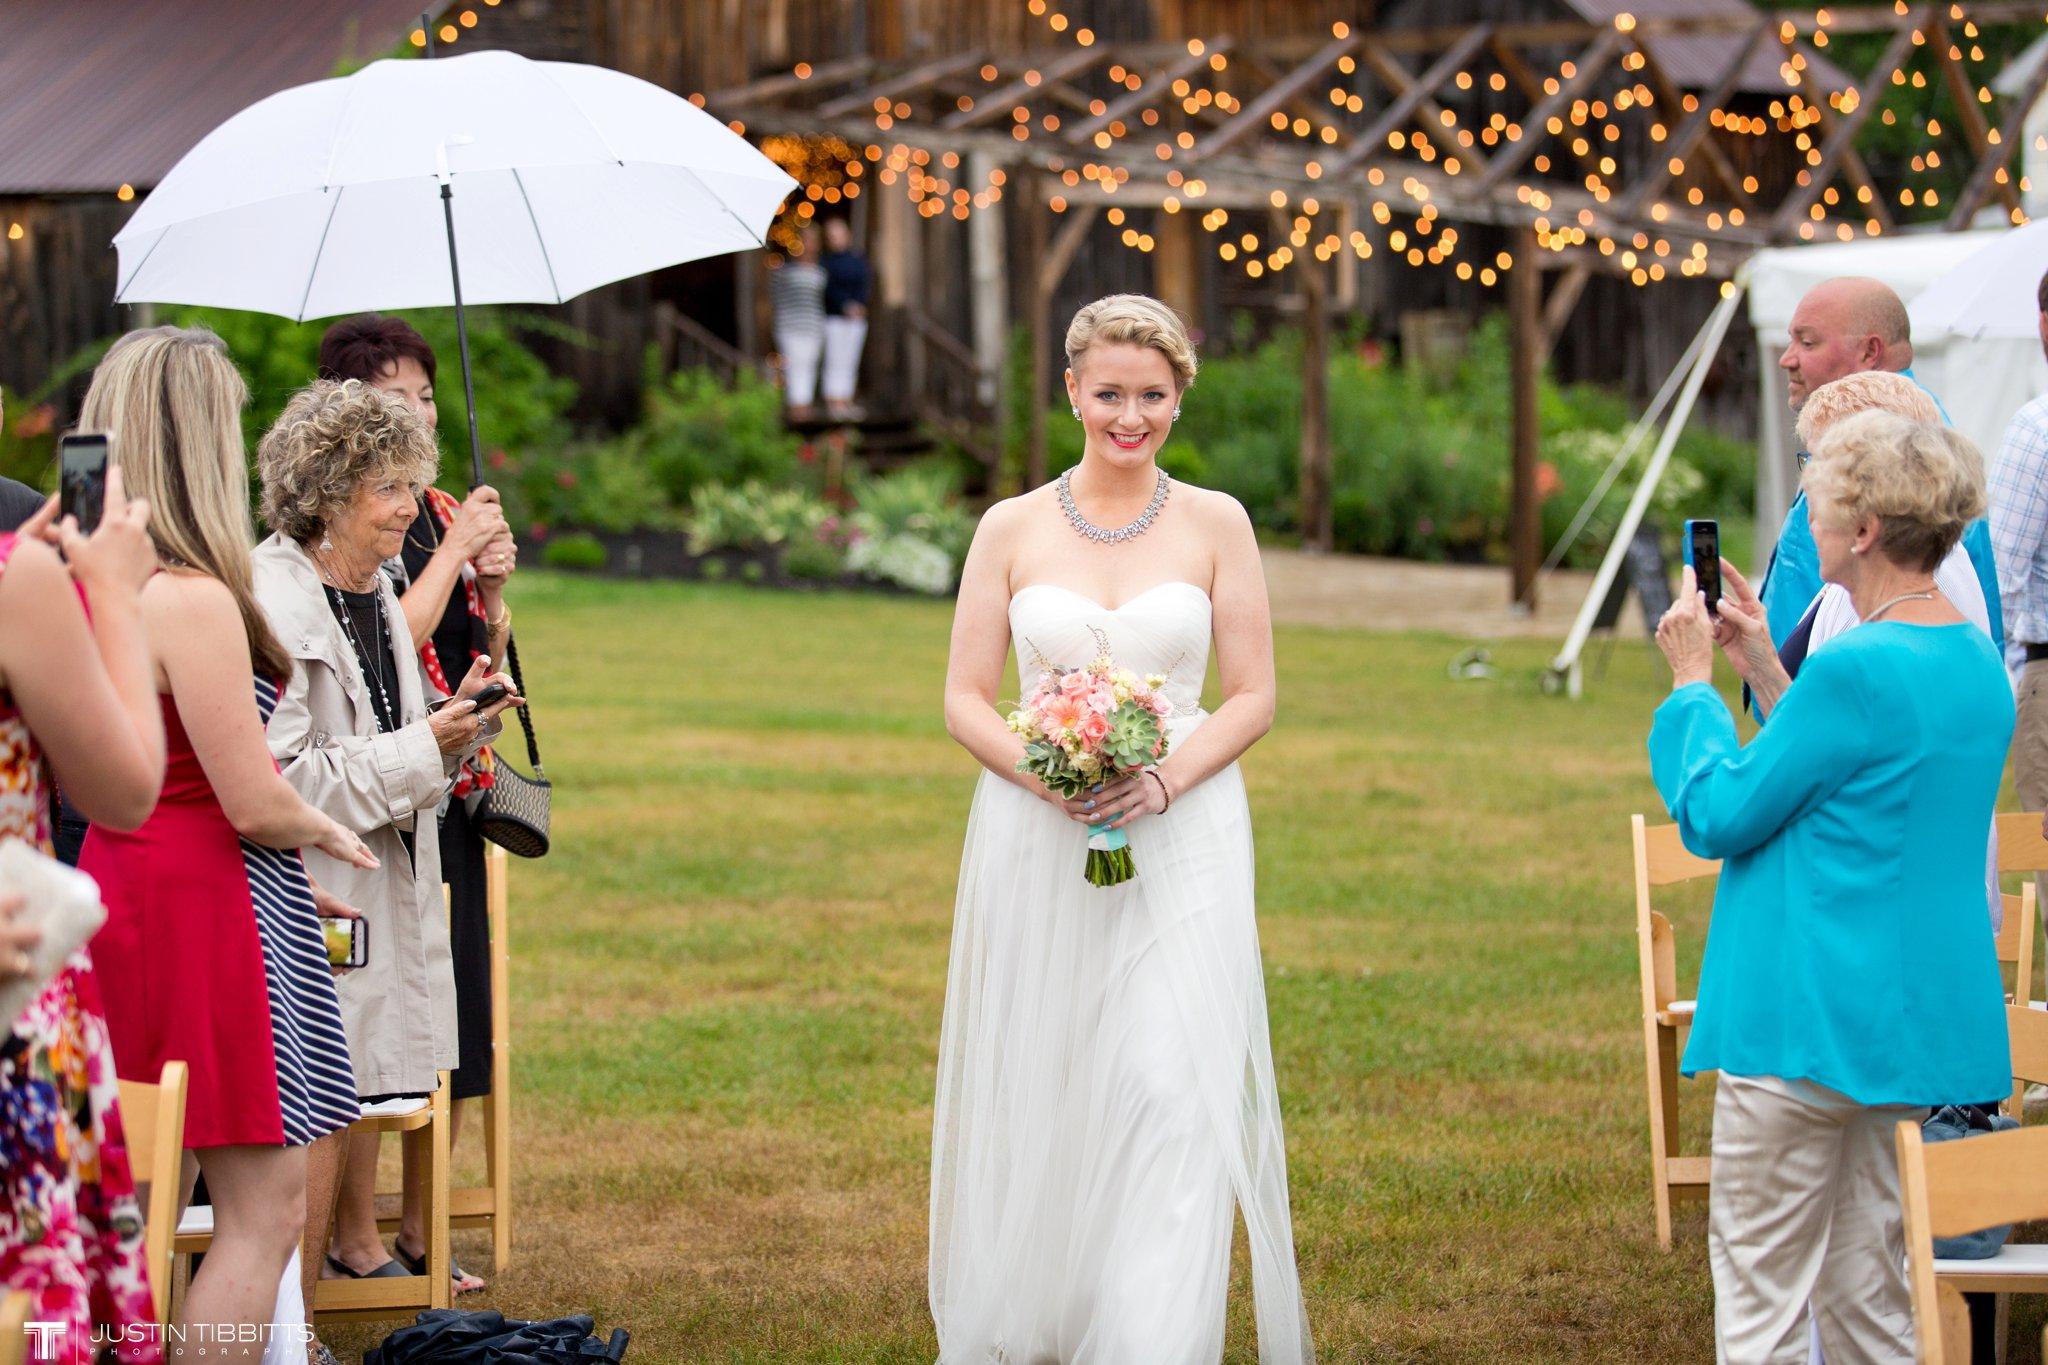 burlap-and-beams-wedding-photos-with-joran-and-molly_0055